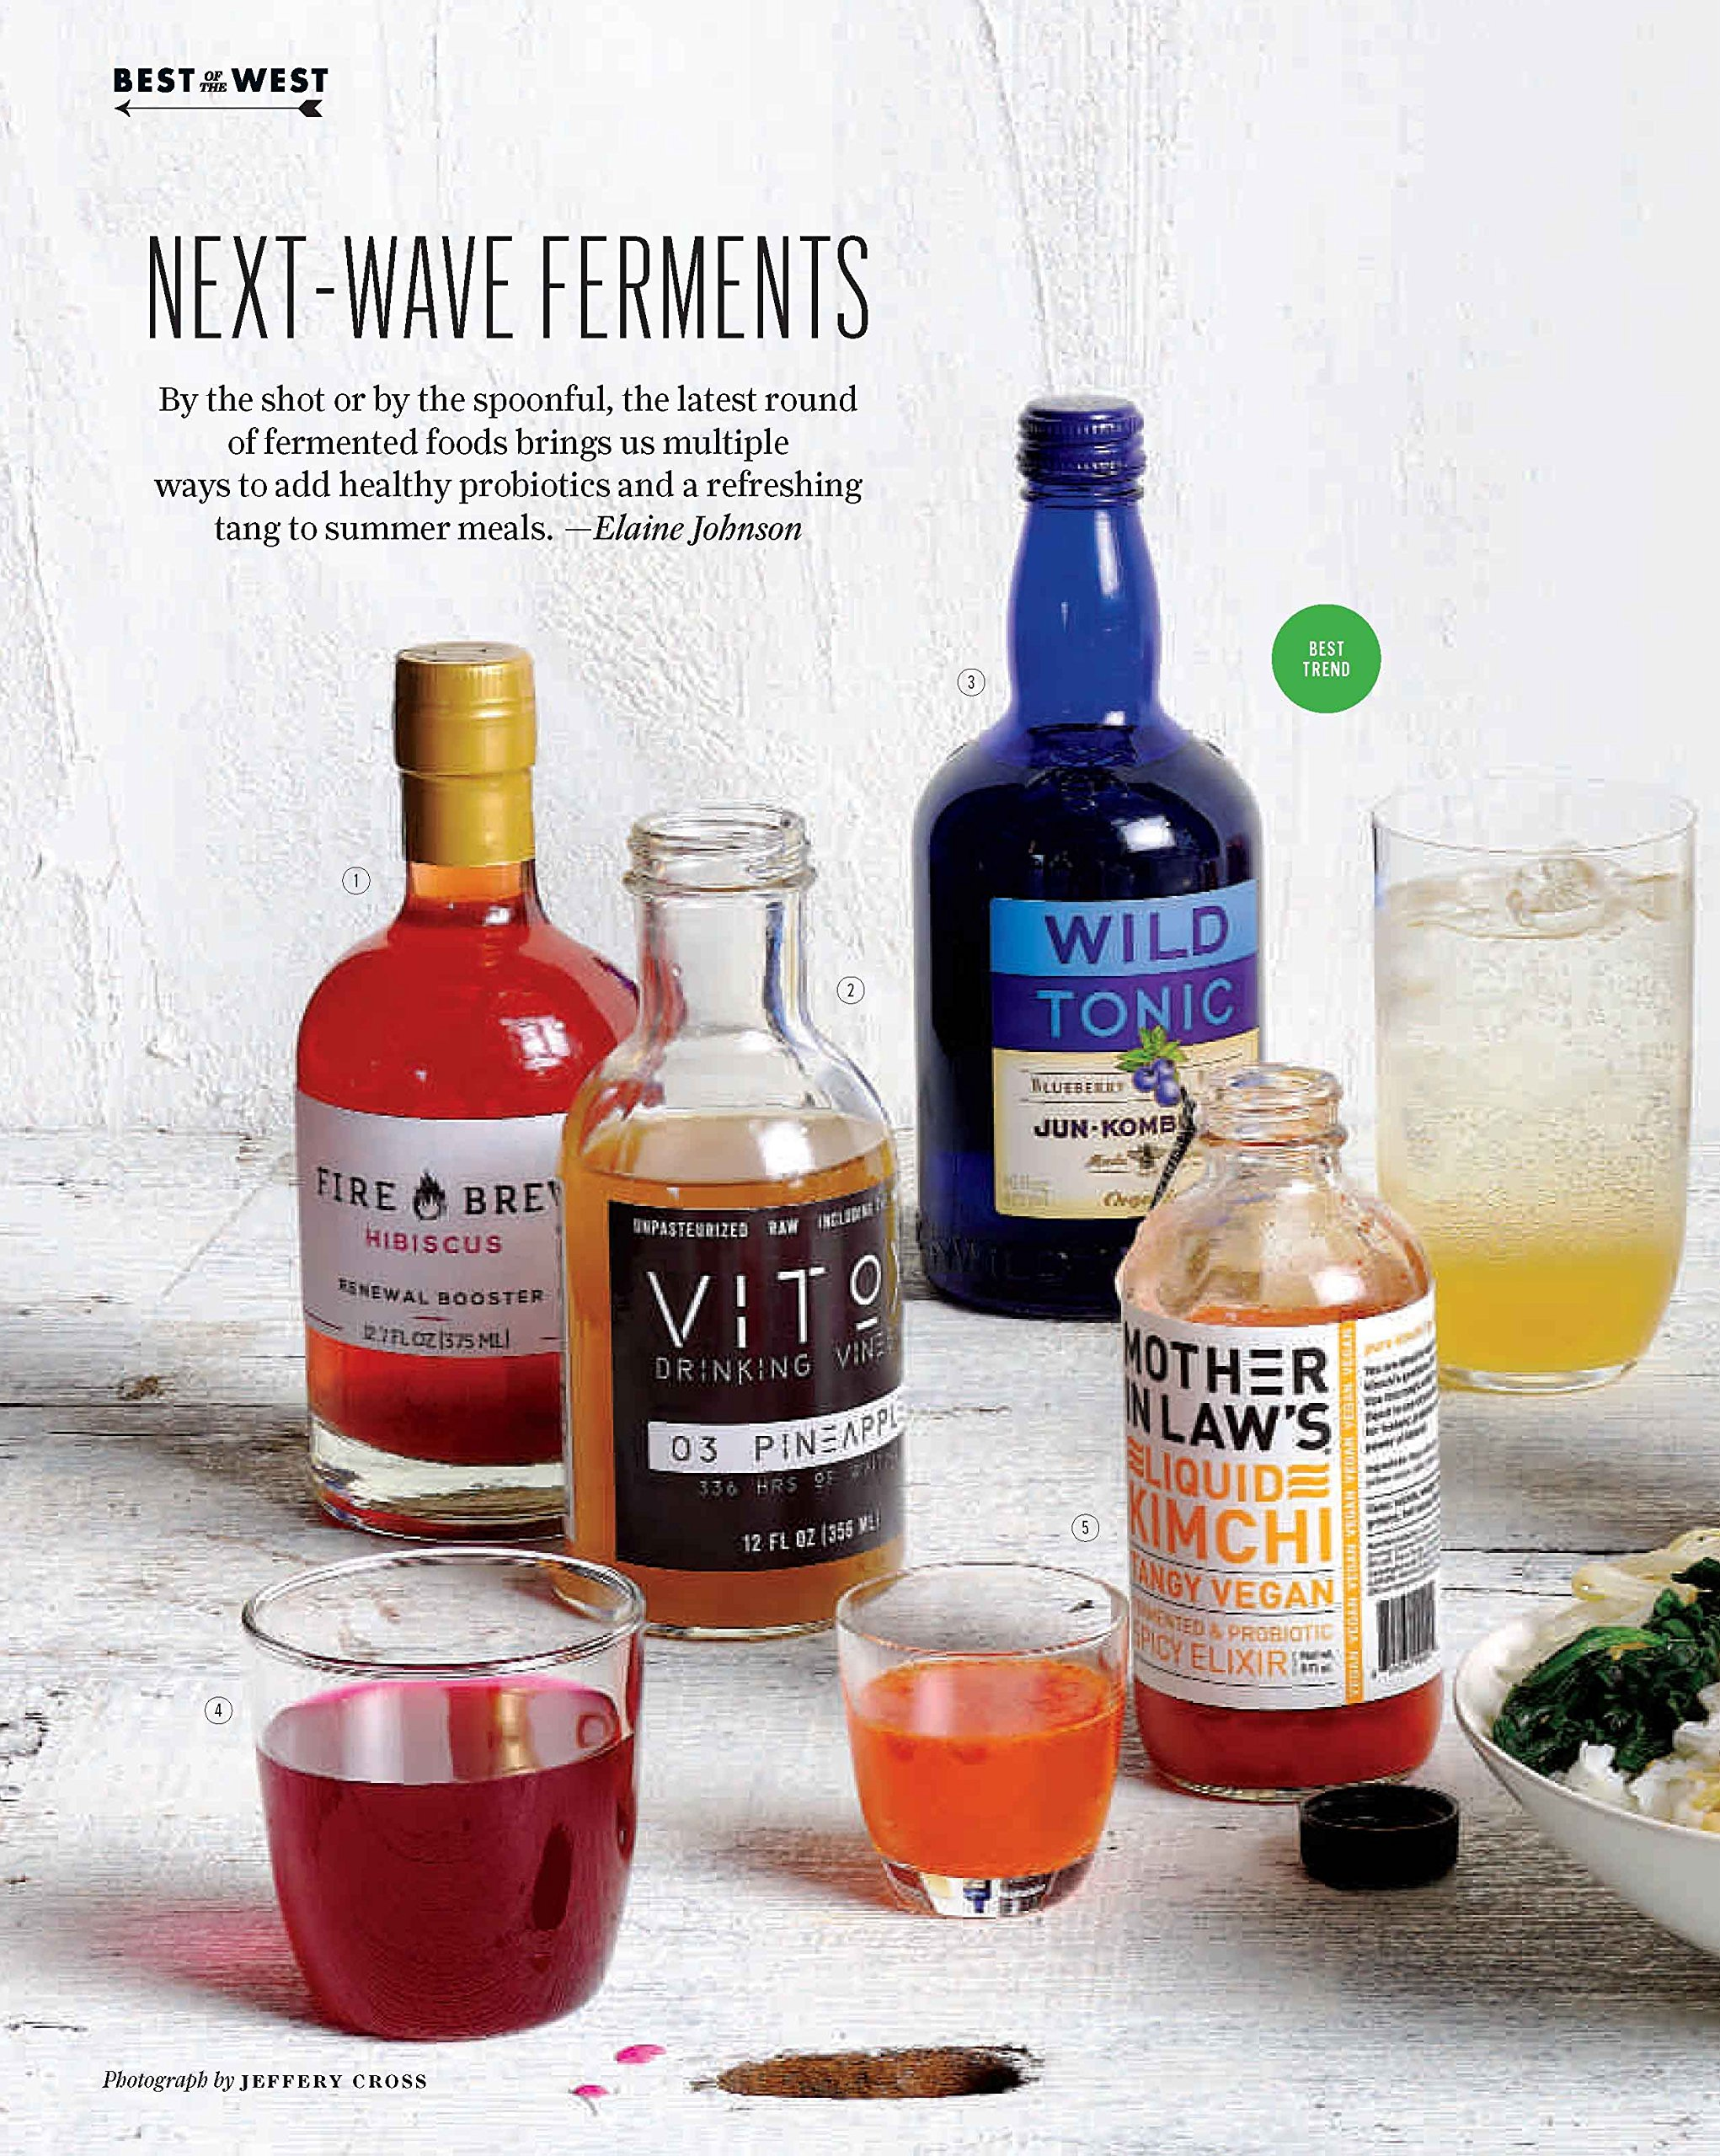 Vitox Drinking Vinegar - Grapefruit - 12OZ by Vitox Drinking Vinegar (Image #5)